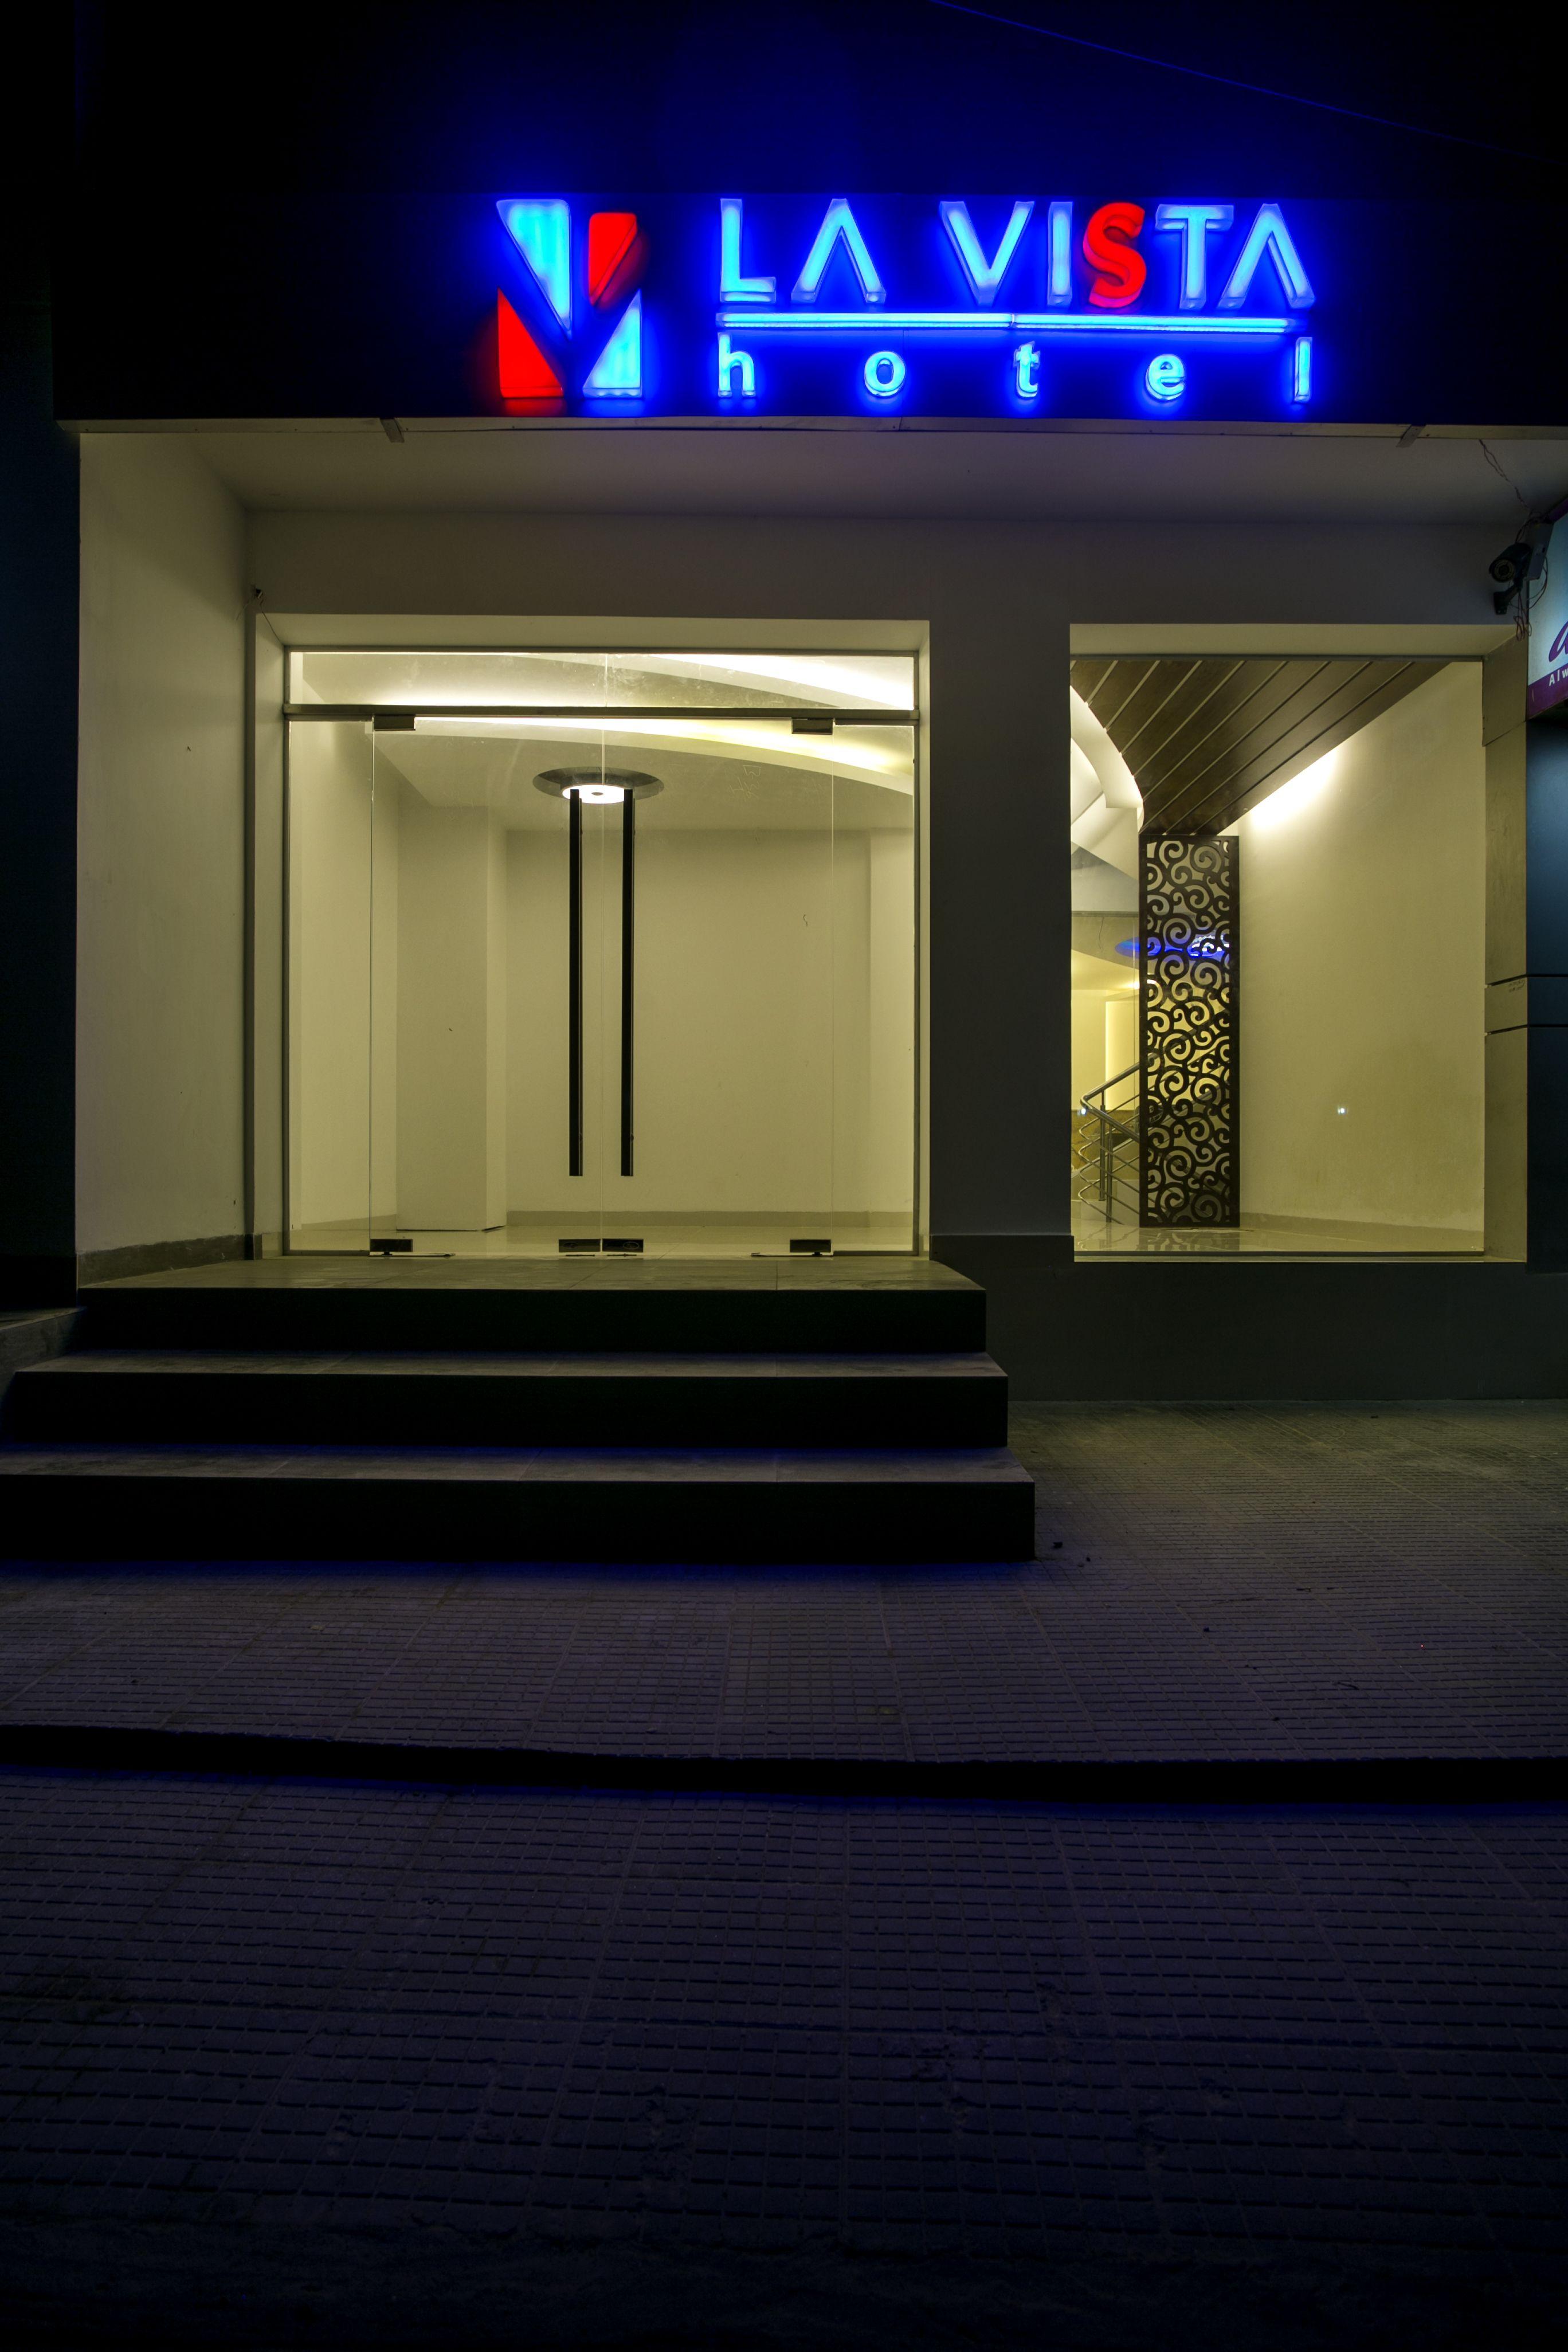 Pin By La Vista Hotel The Boutique On La Vista At A Glance Rooftop Restaurant Breathtaking Views Vista